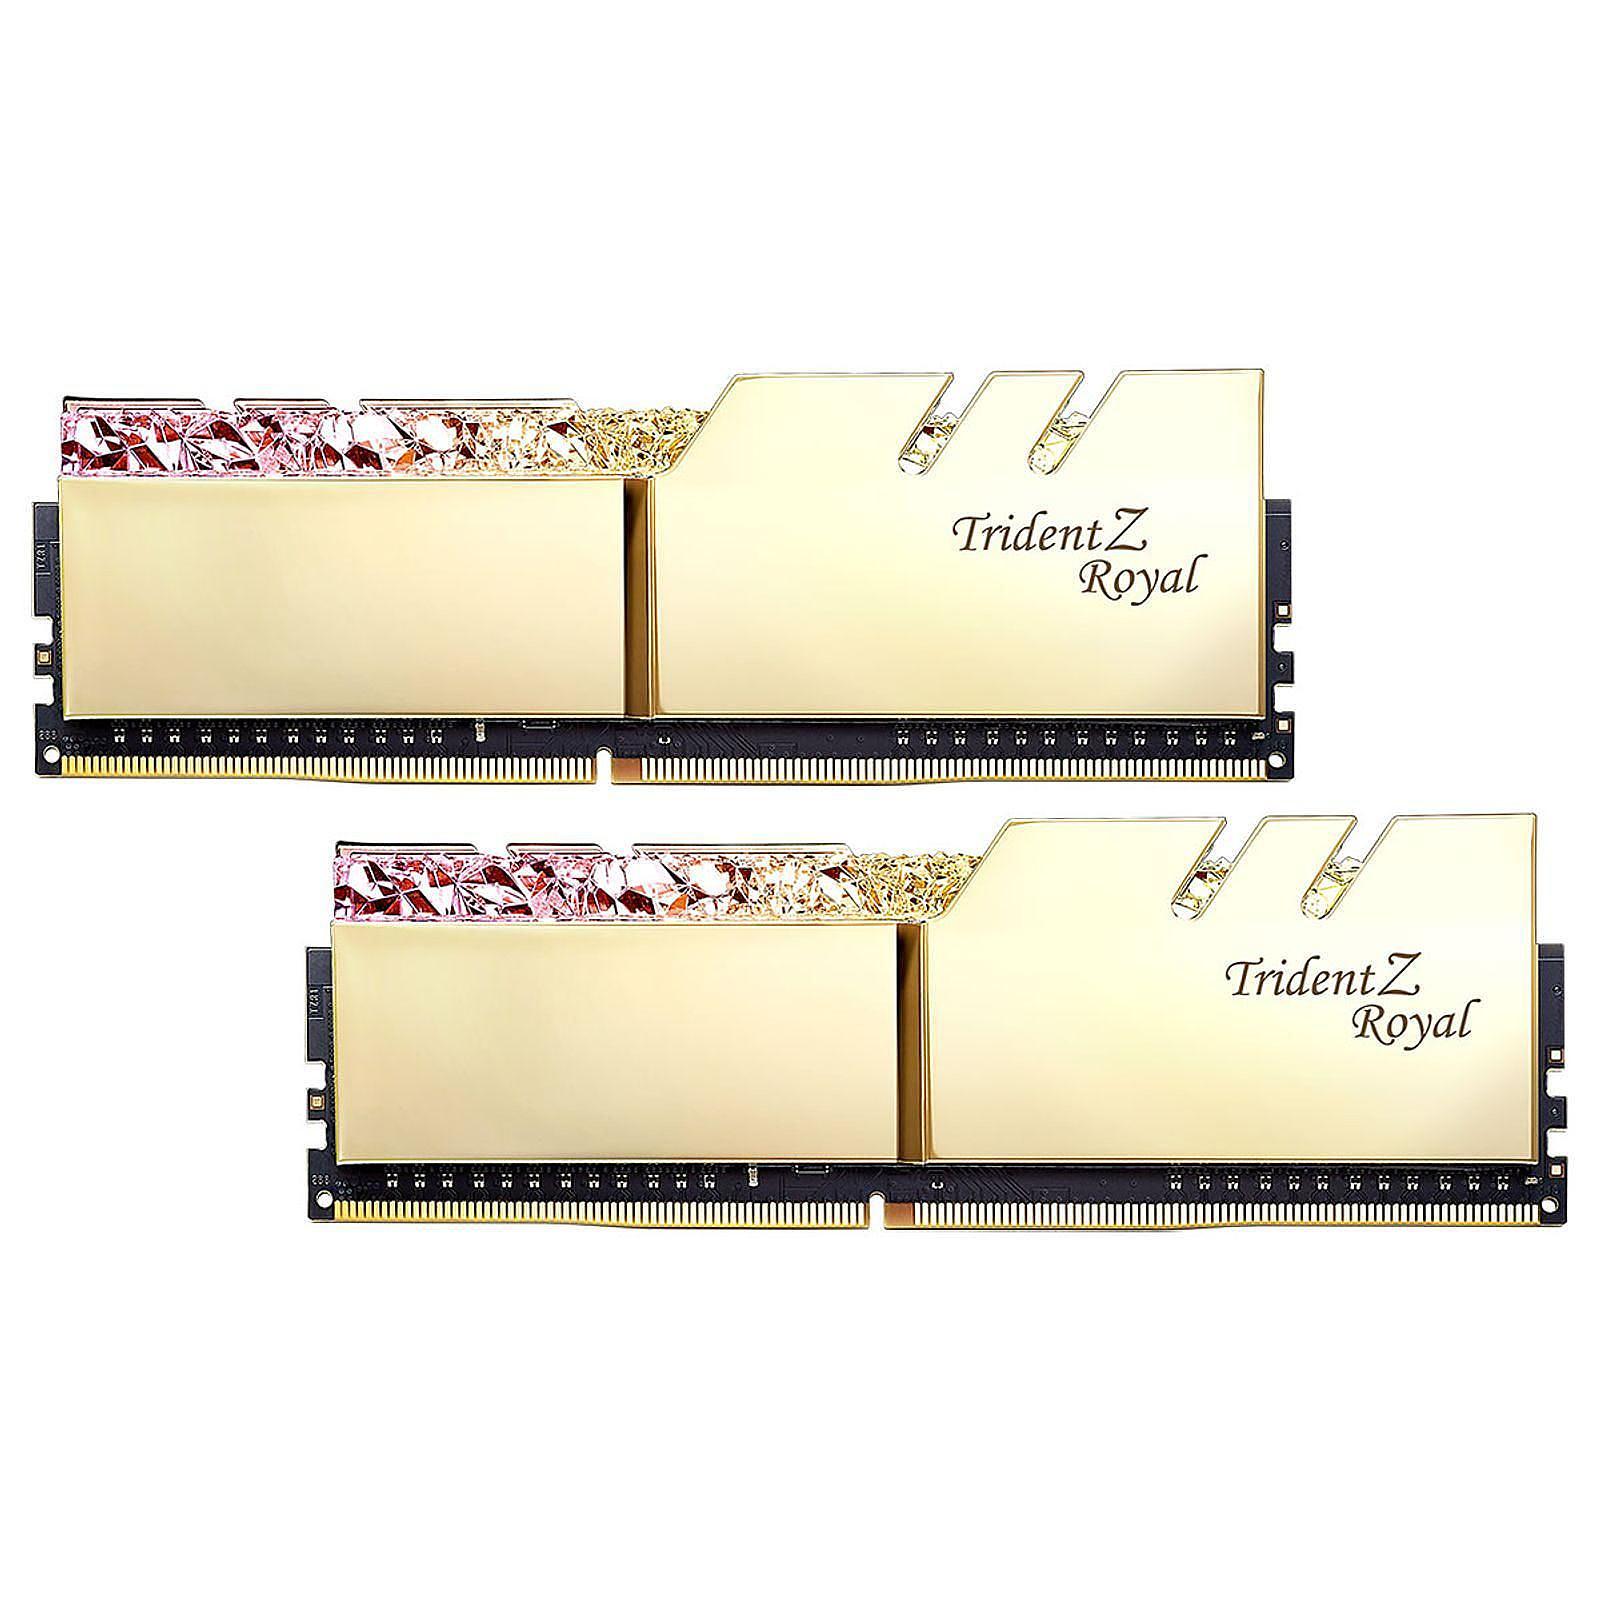 G.Skill Trident Z Royal 16 GB (2 x 8 GB) DDR4 4000 MHz CL17 - Oro